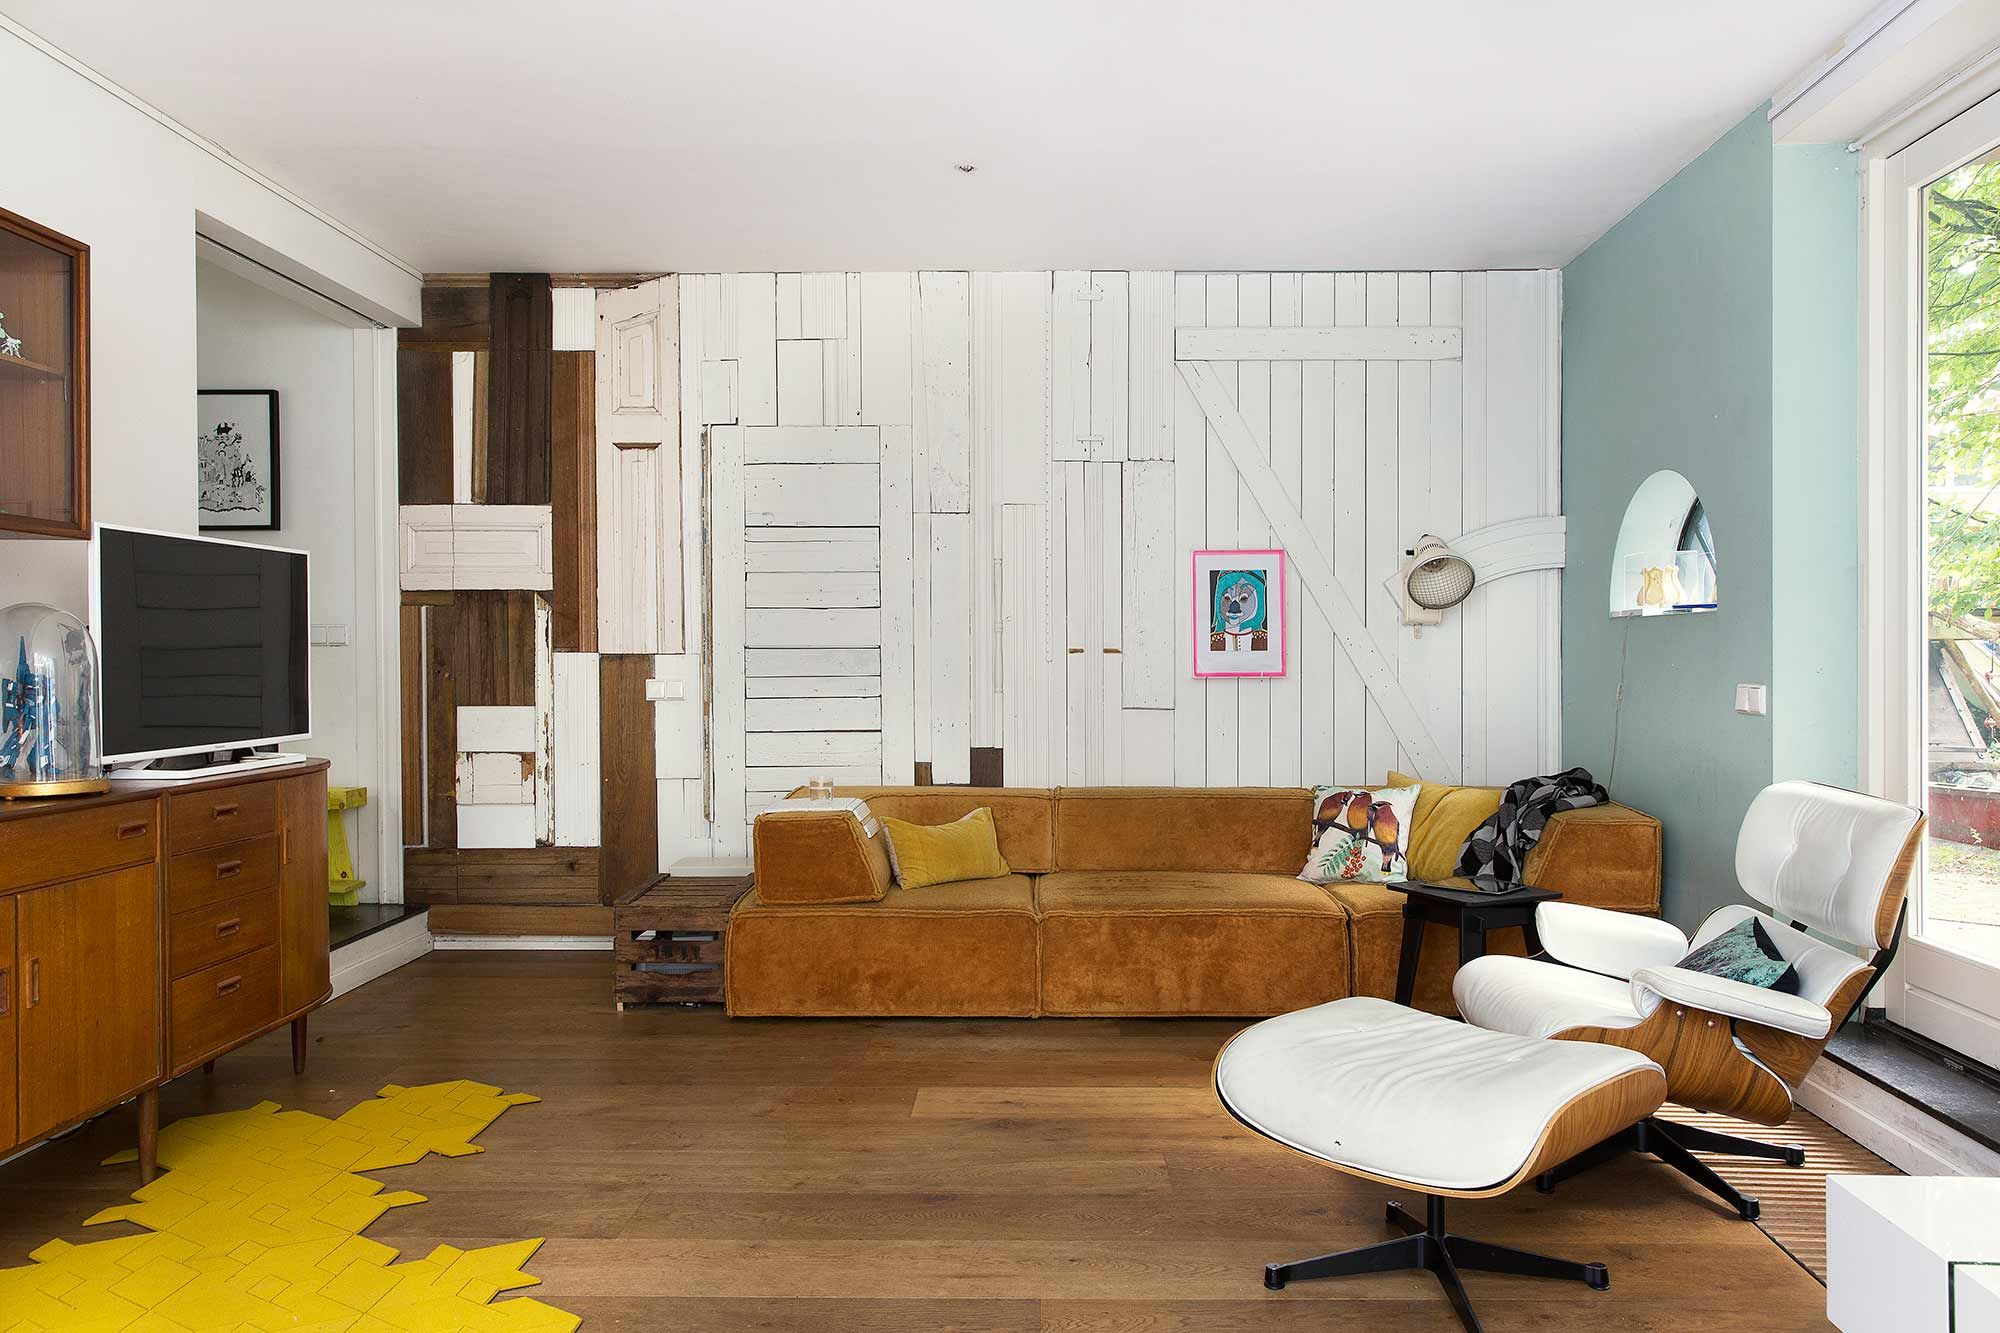 woonkamer | livingroom | vtwonen 5-2016 | Photography Jansje Klazinga | Styling Emmy van Dantzig